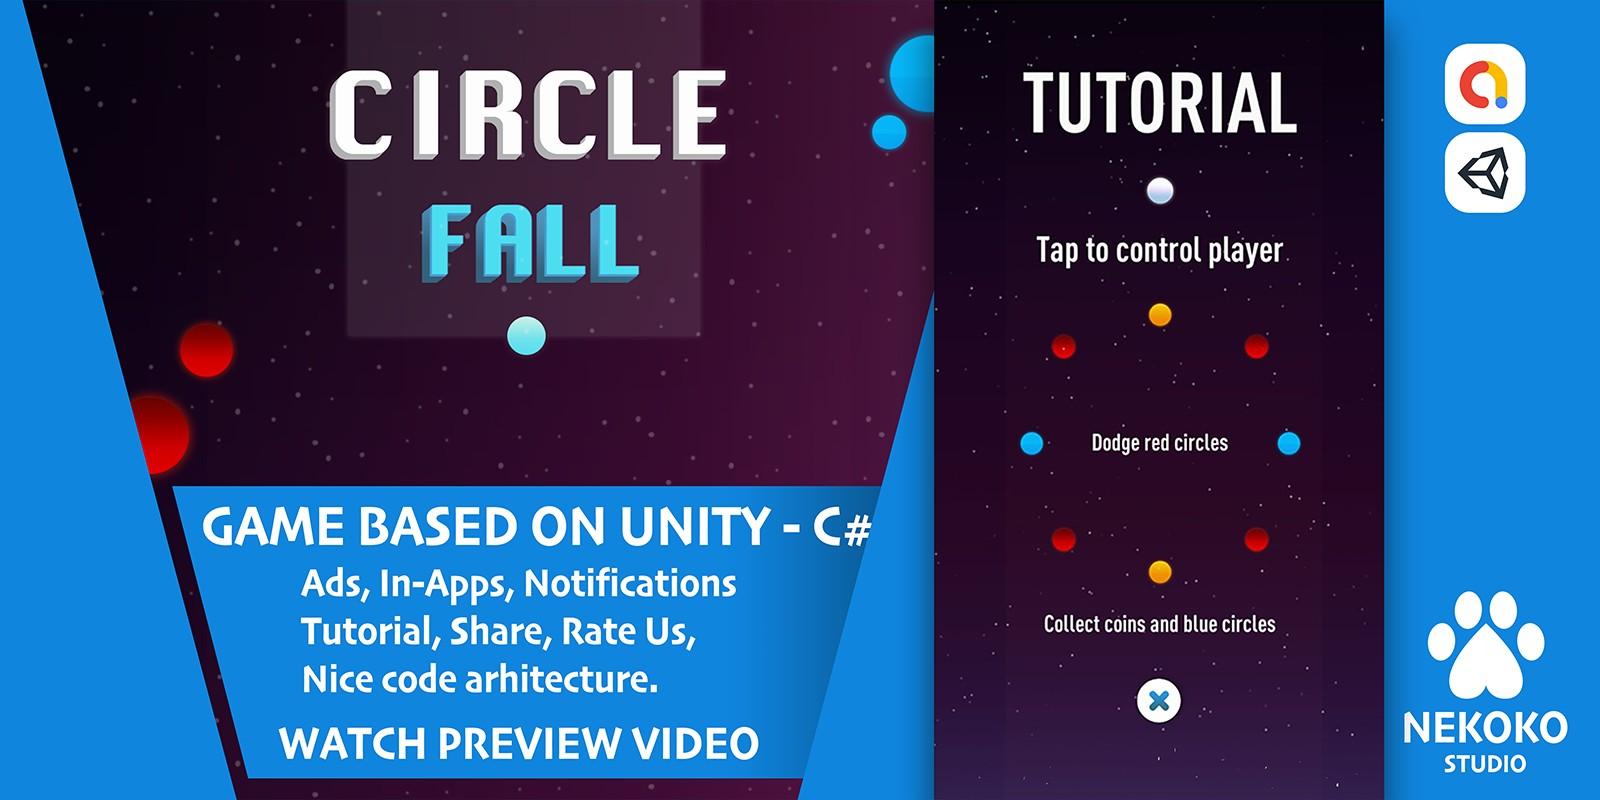 Circle Fall - Unity Source Code